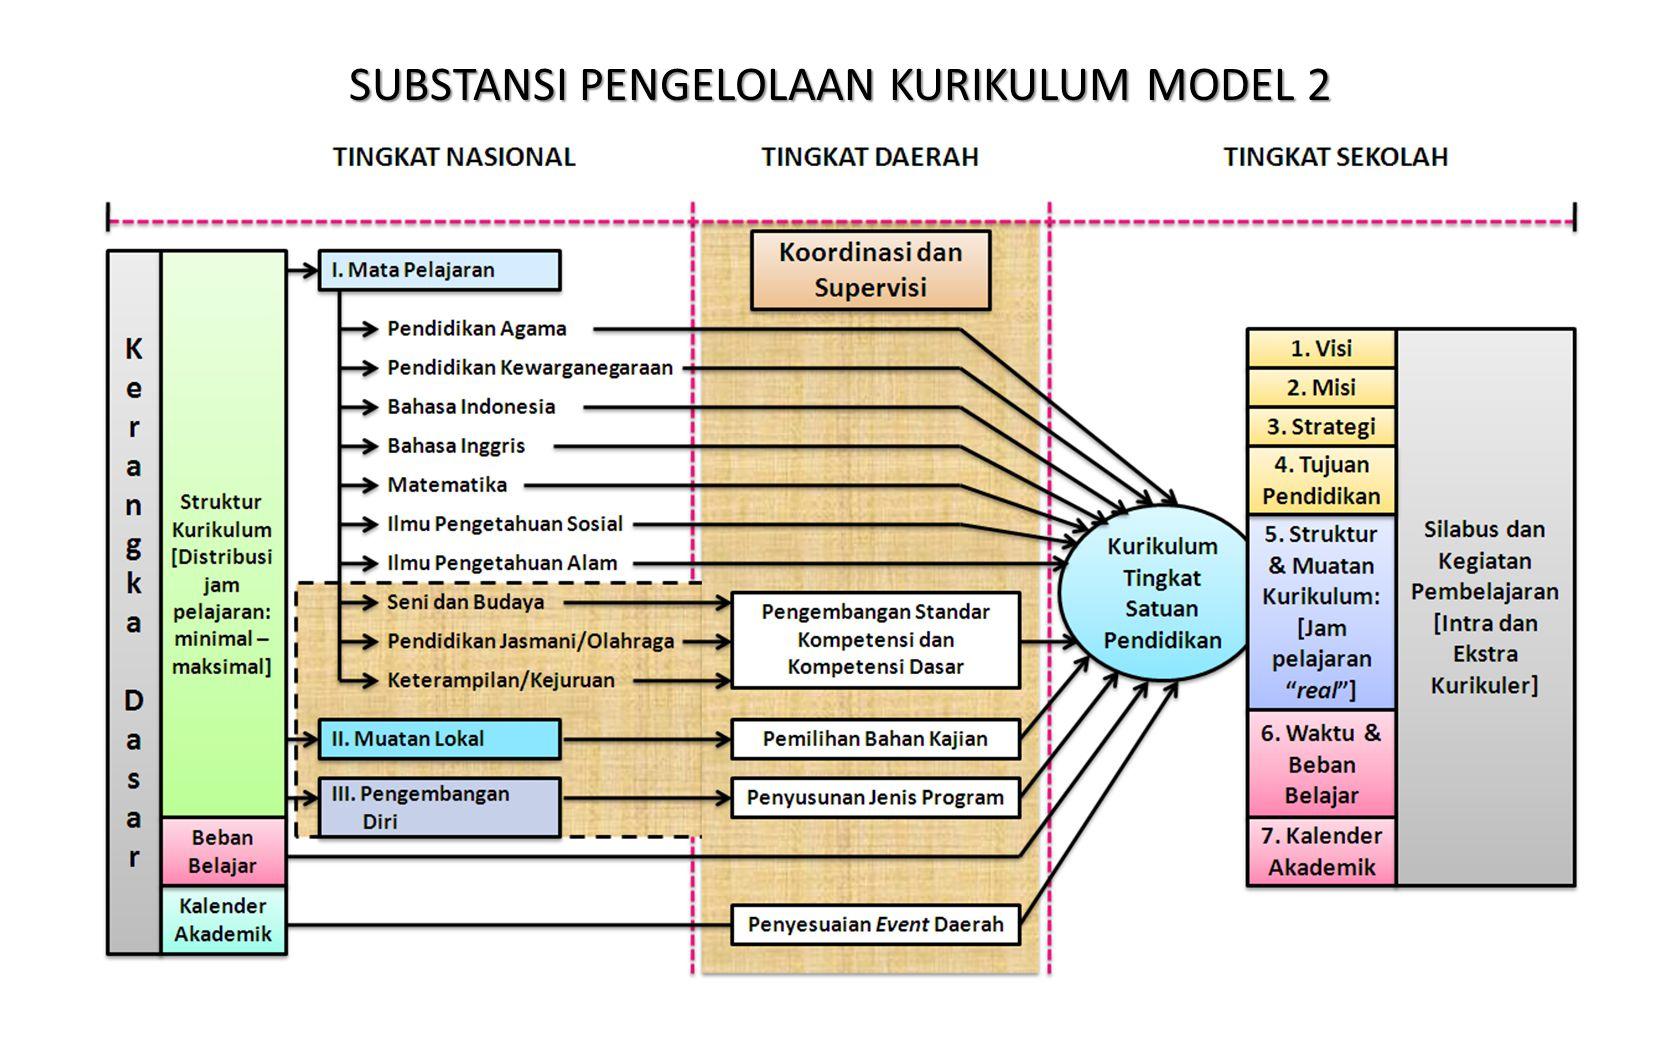 SUBSTANSI PENGELOLAAN KURIKULUM MODEL 2